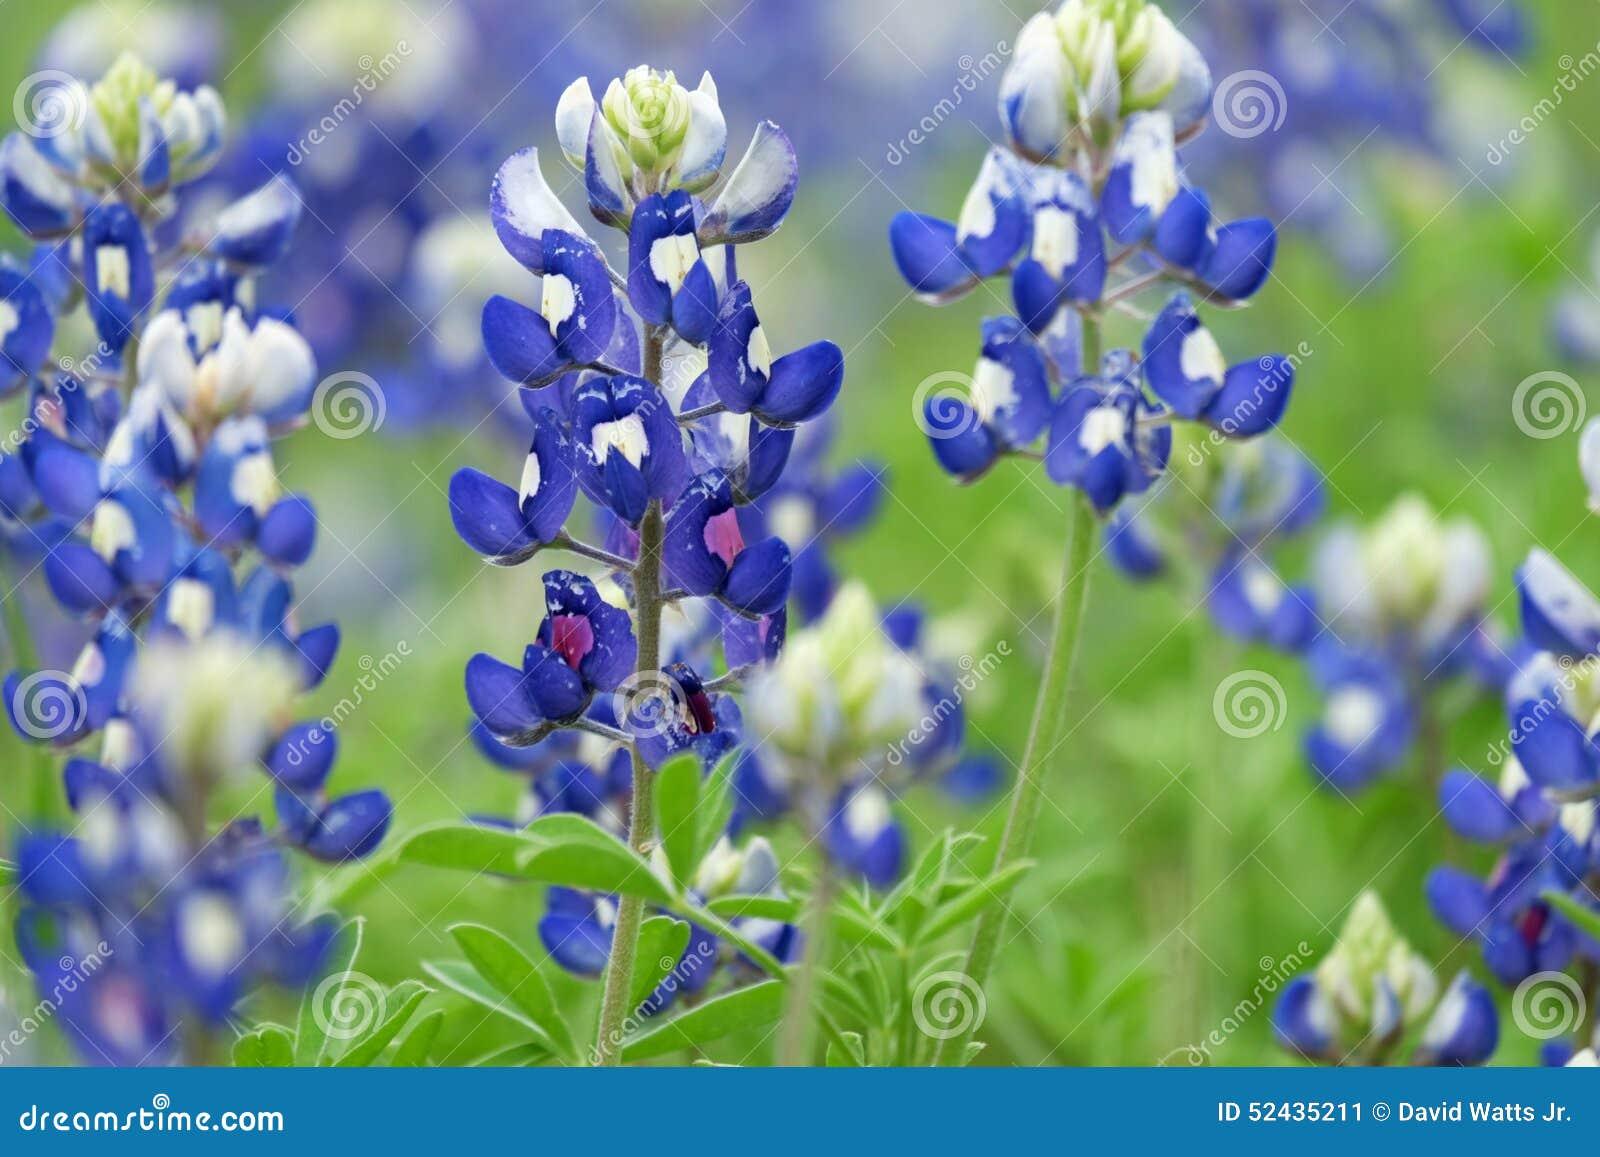 Bountiful Bluebonnets